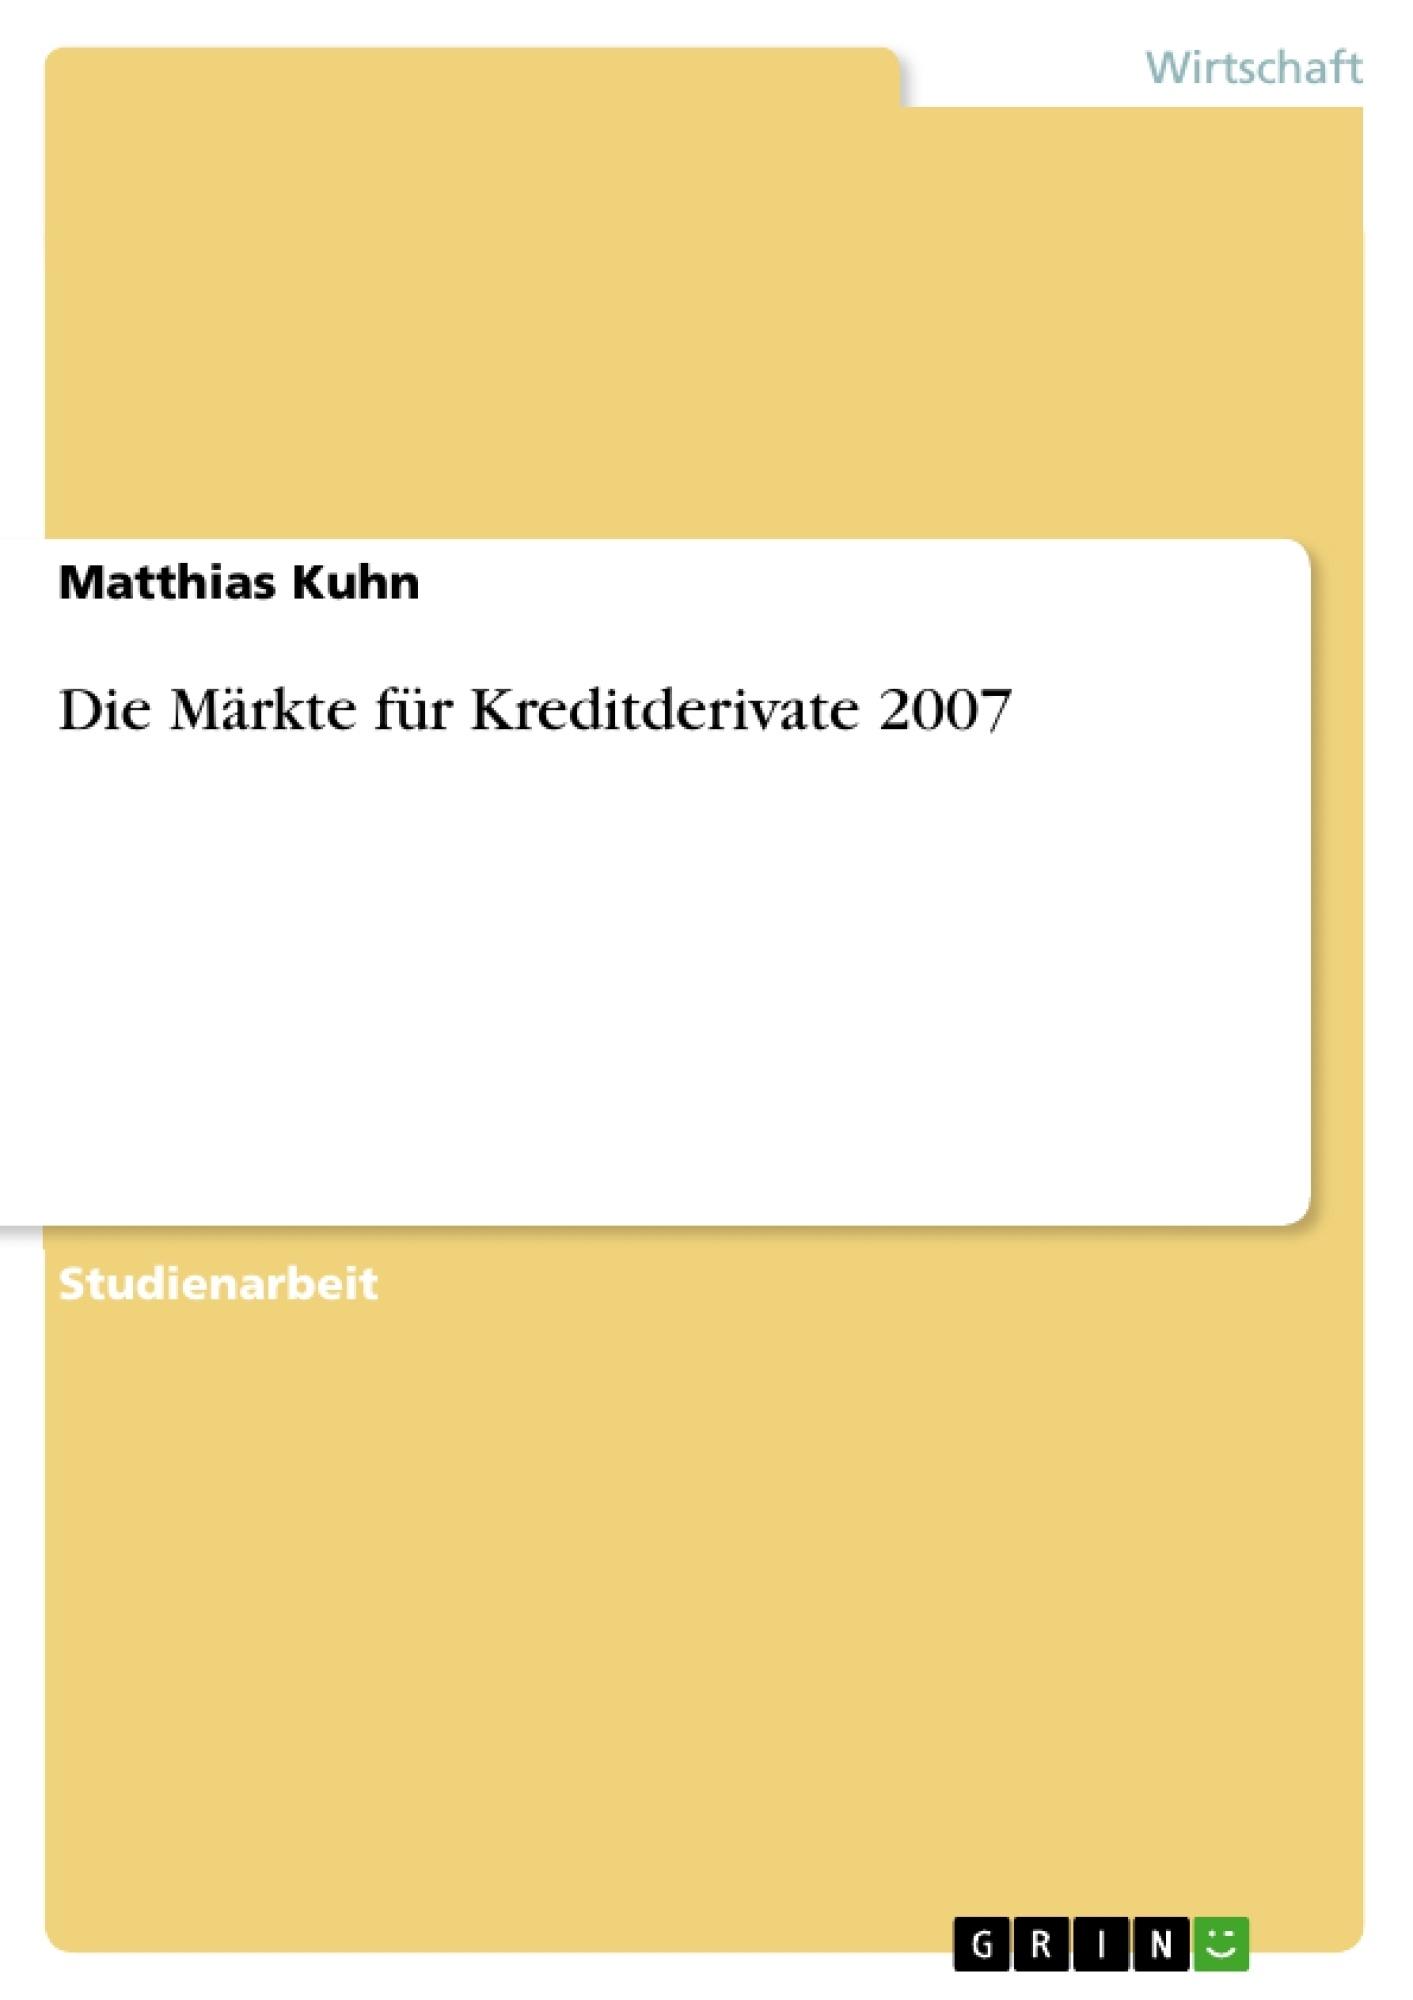 Titel: Die Märkte für Kreditderivate 2007